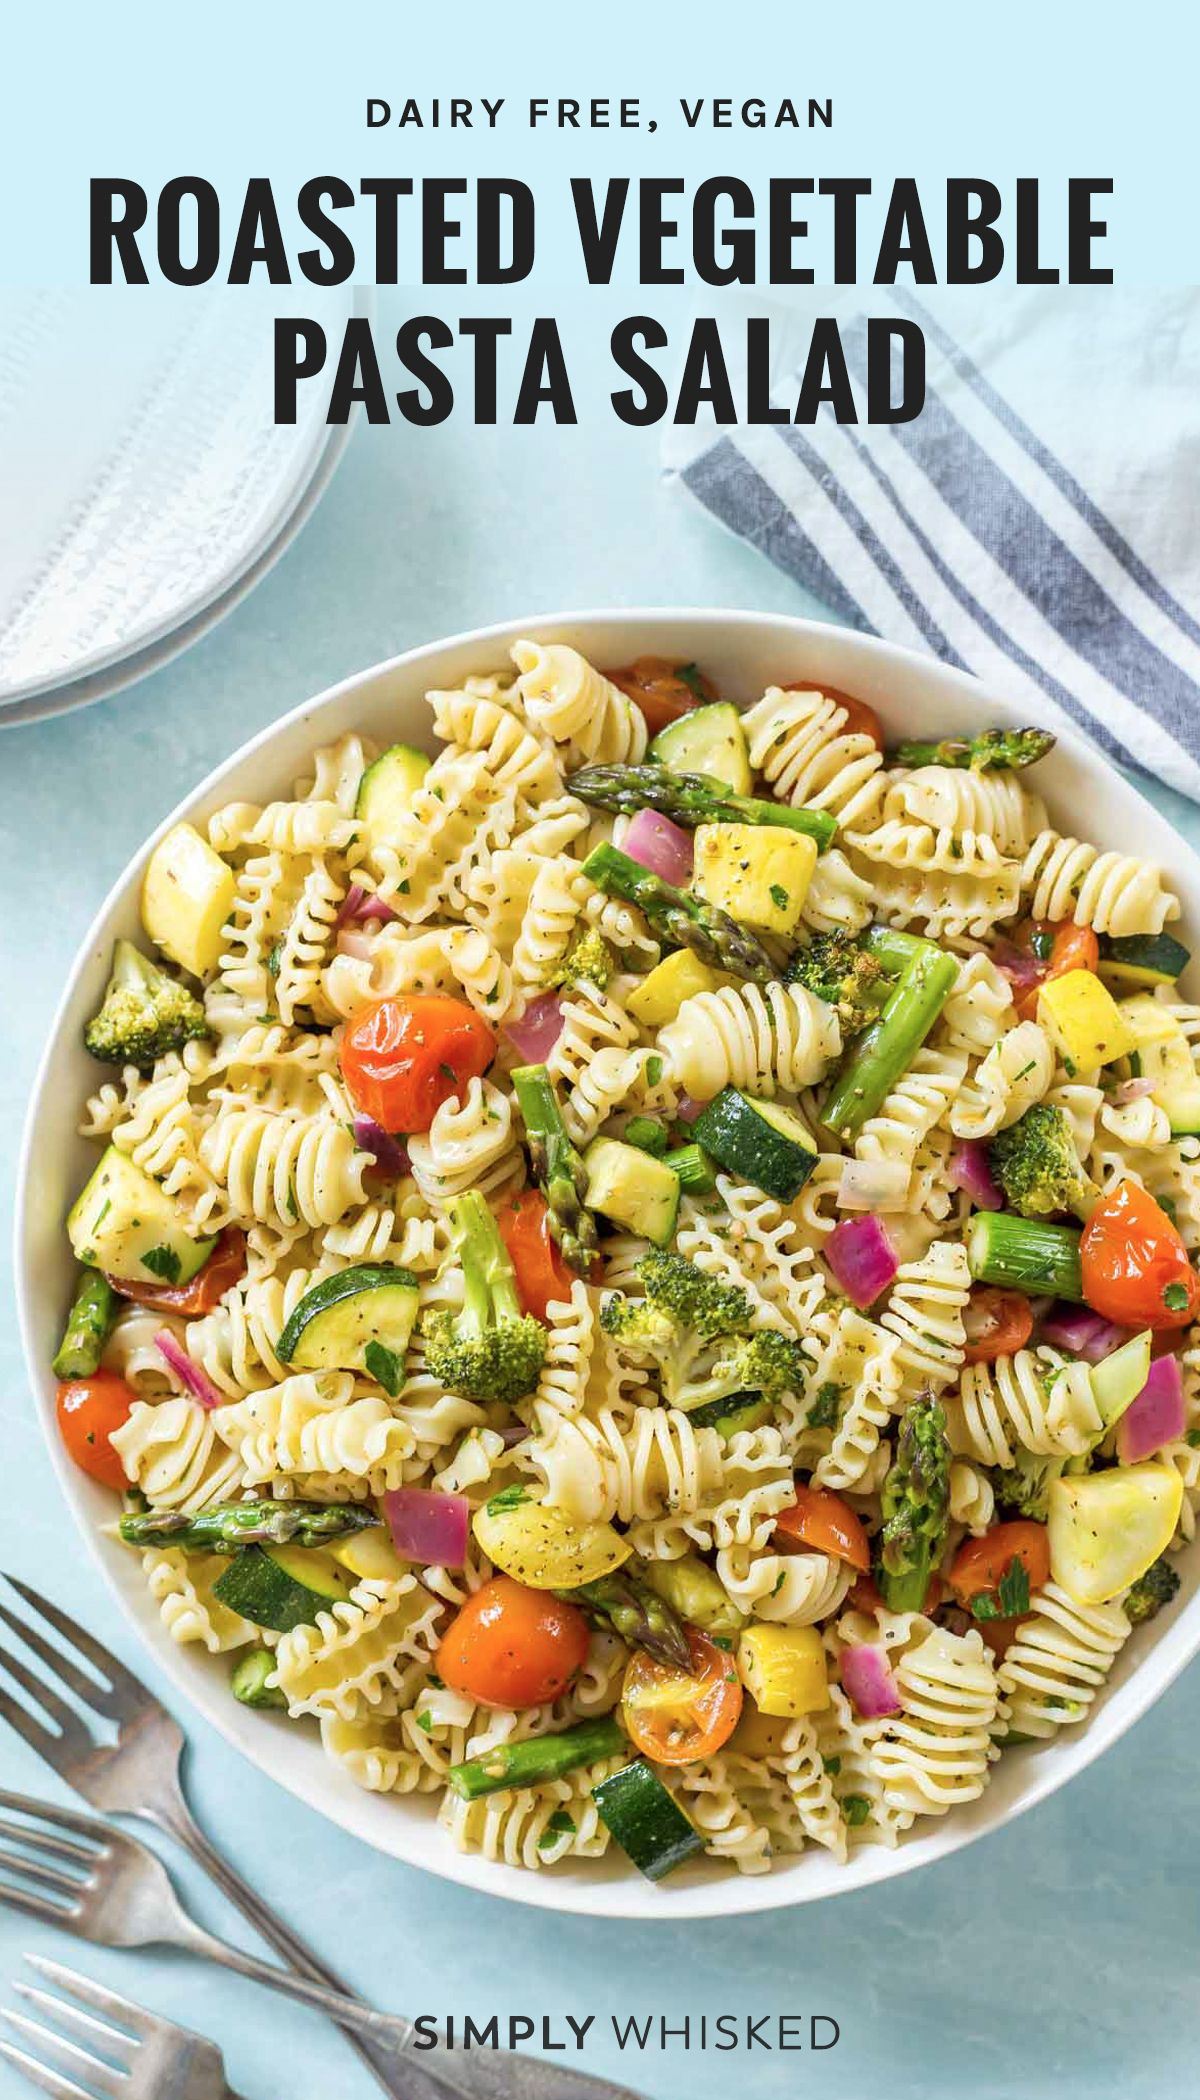 Roasted Vegetable Pasta Salad Dairy Free Vegan Simply Whisked Recipe In 2020 Roasted Vegetable Pasta Vegan Pasta Salad Vegetable Pasta